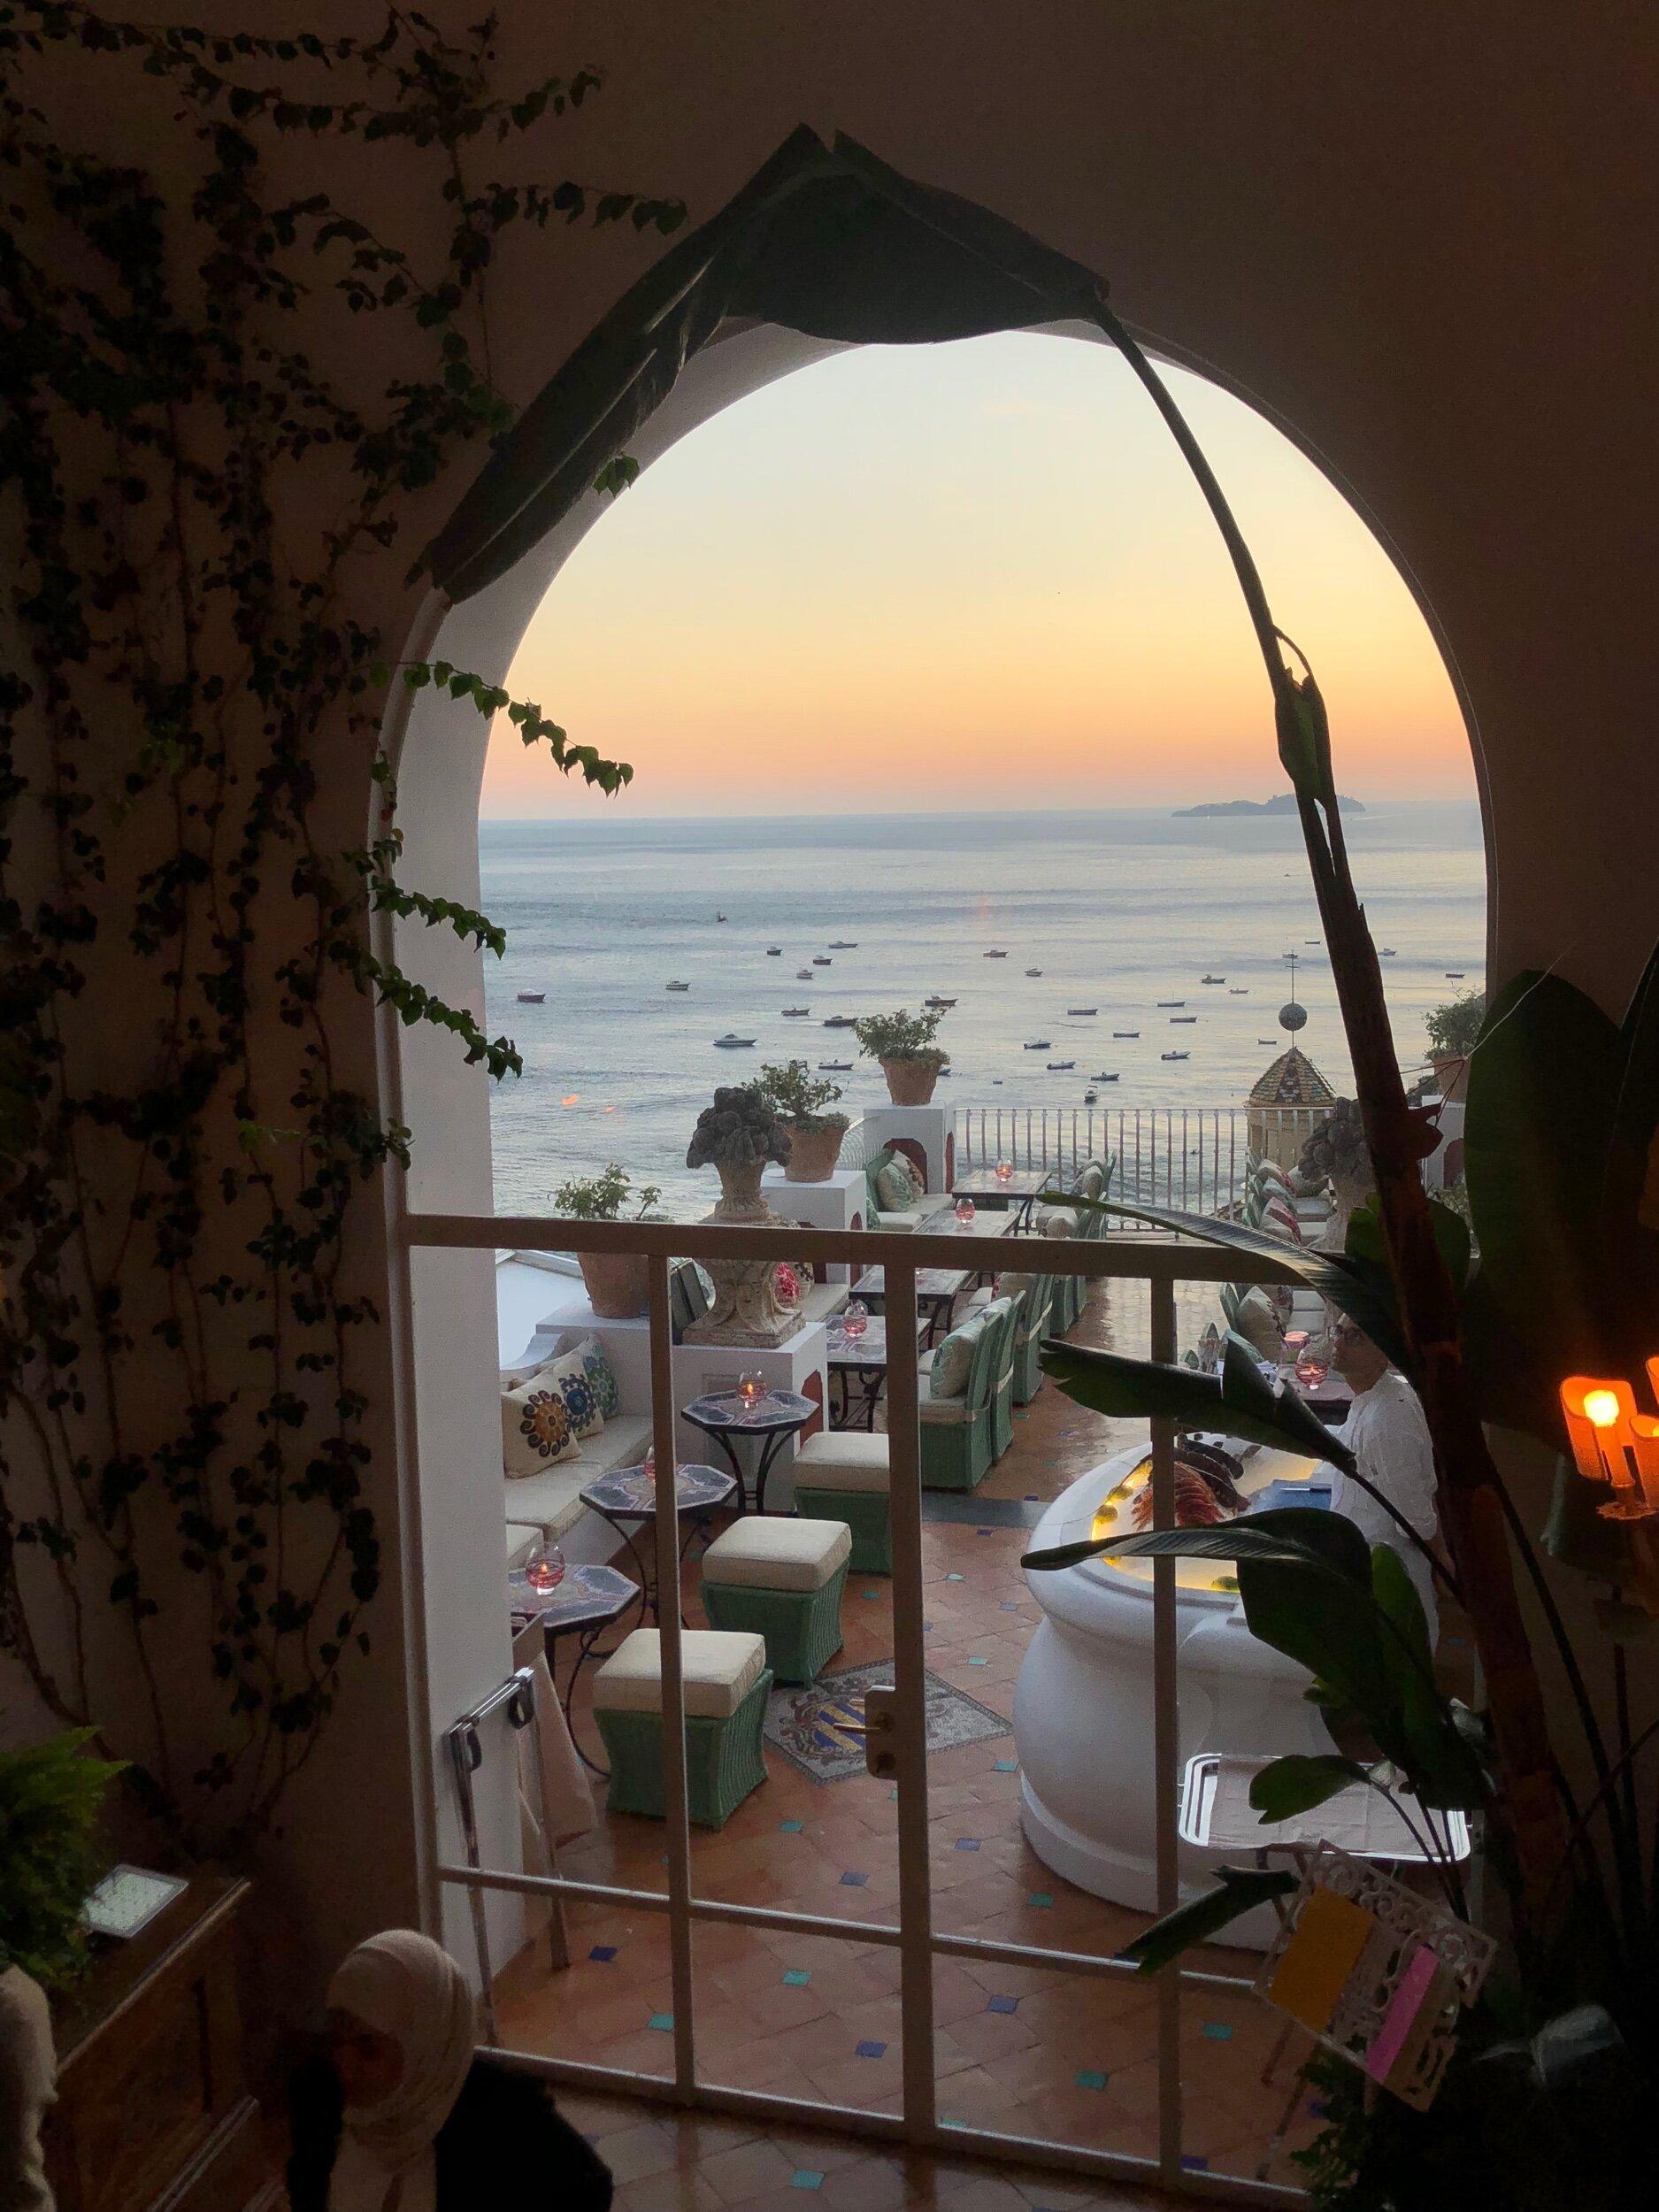 The Sirenuse in Positano